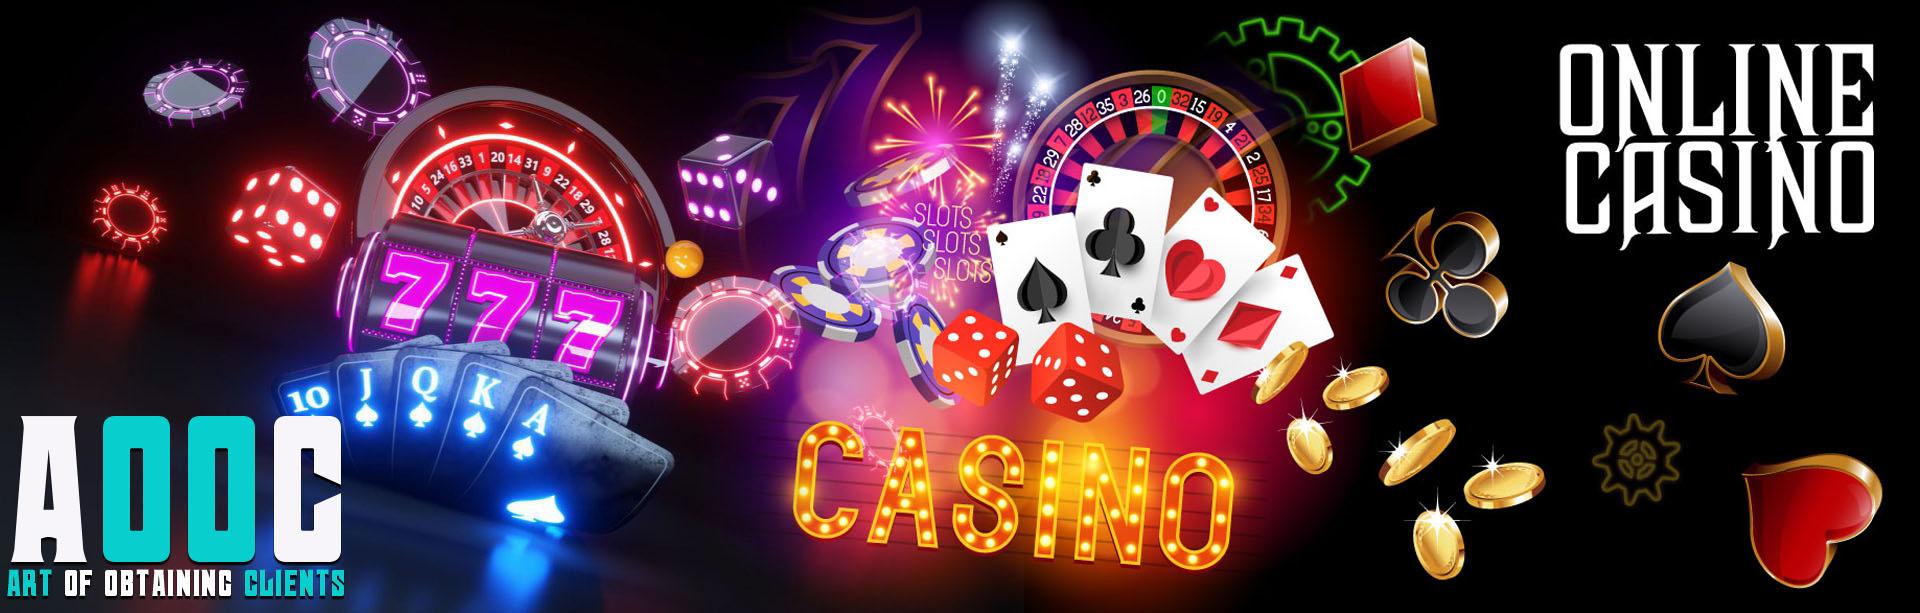 website judi casino